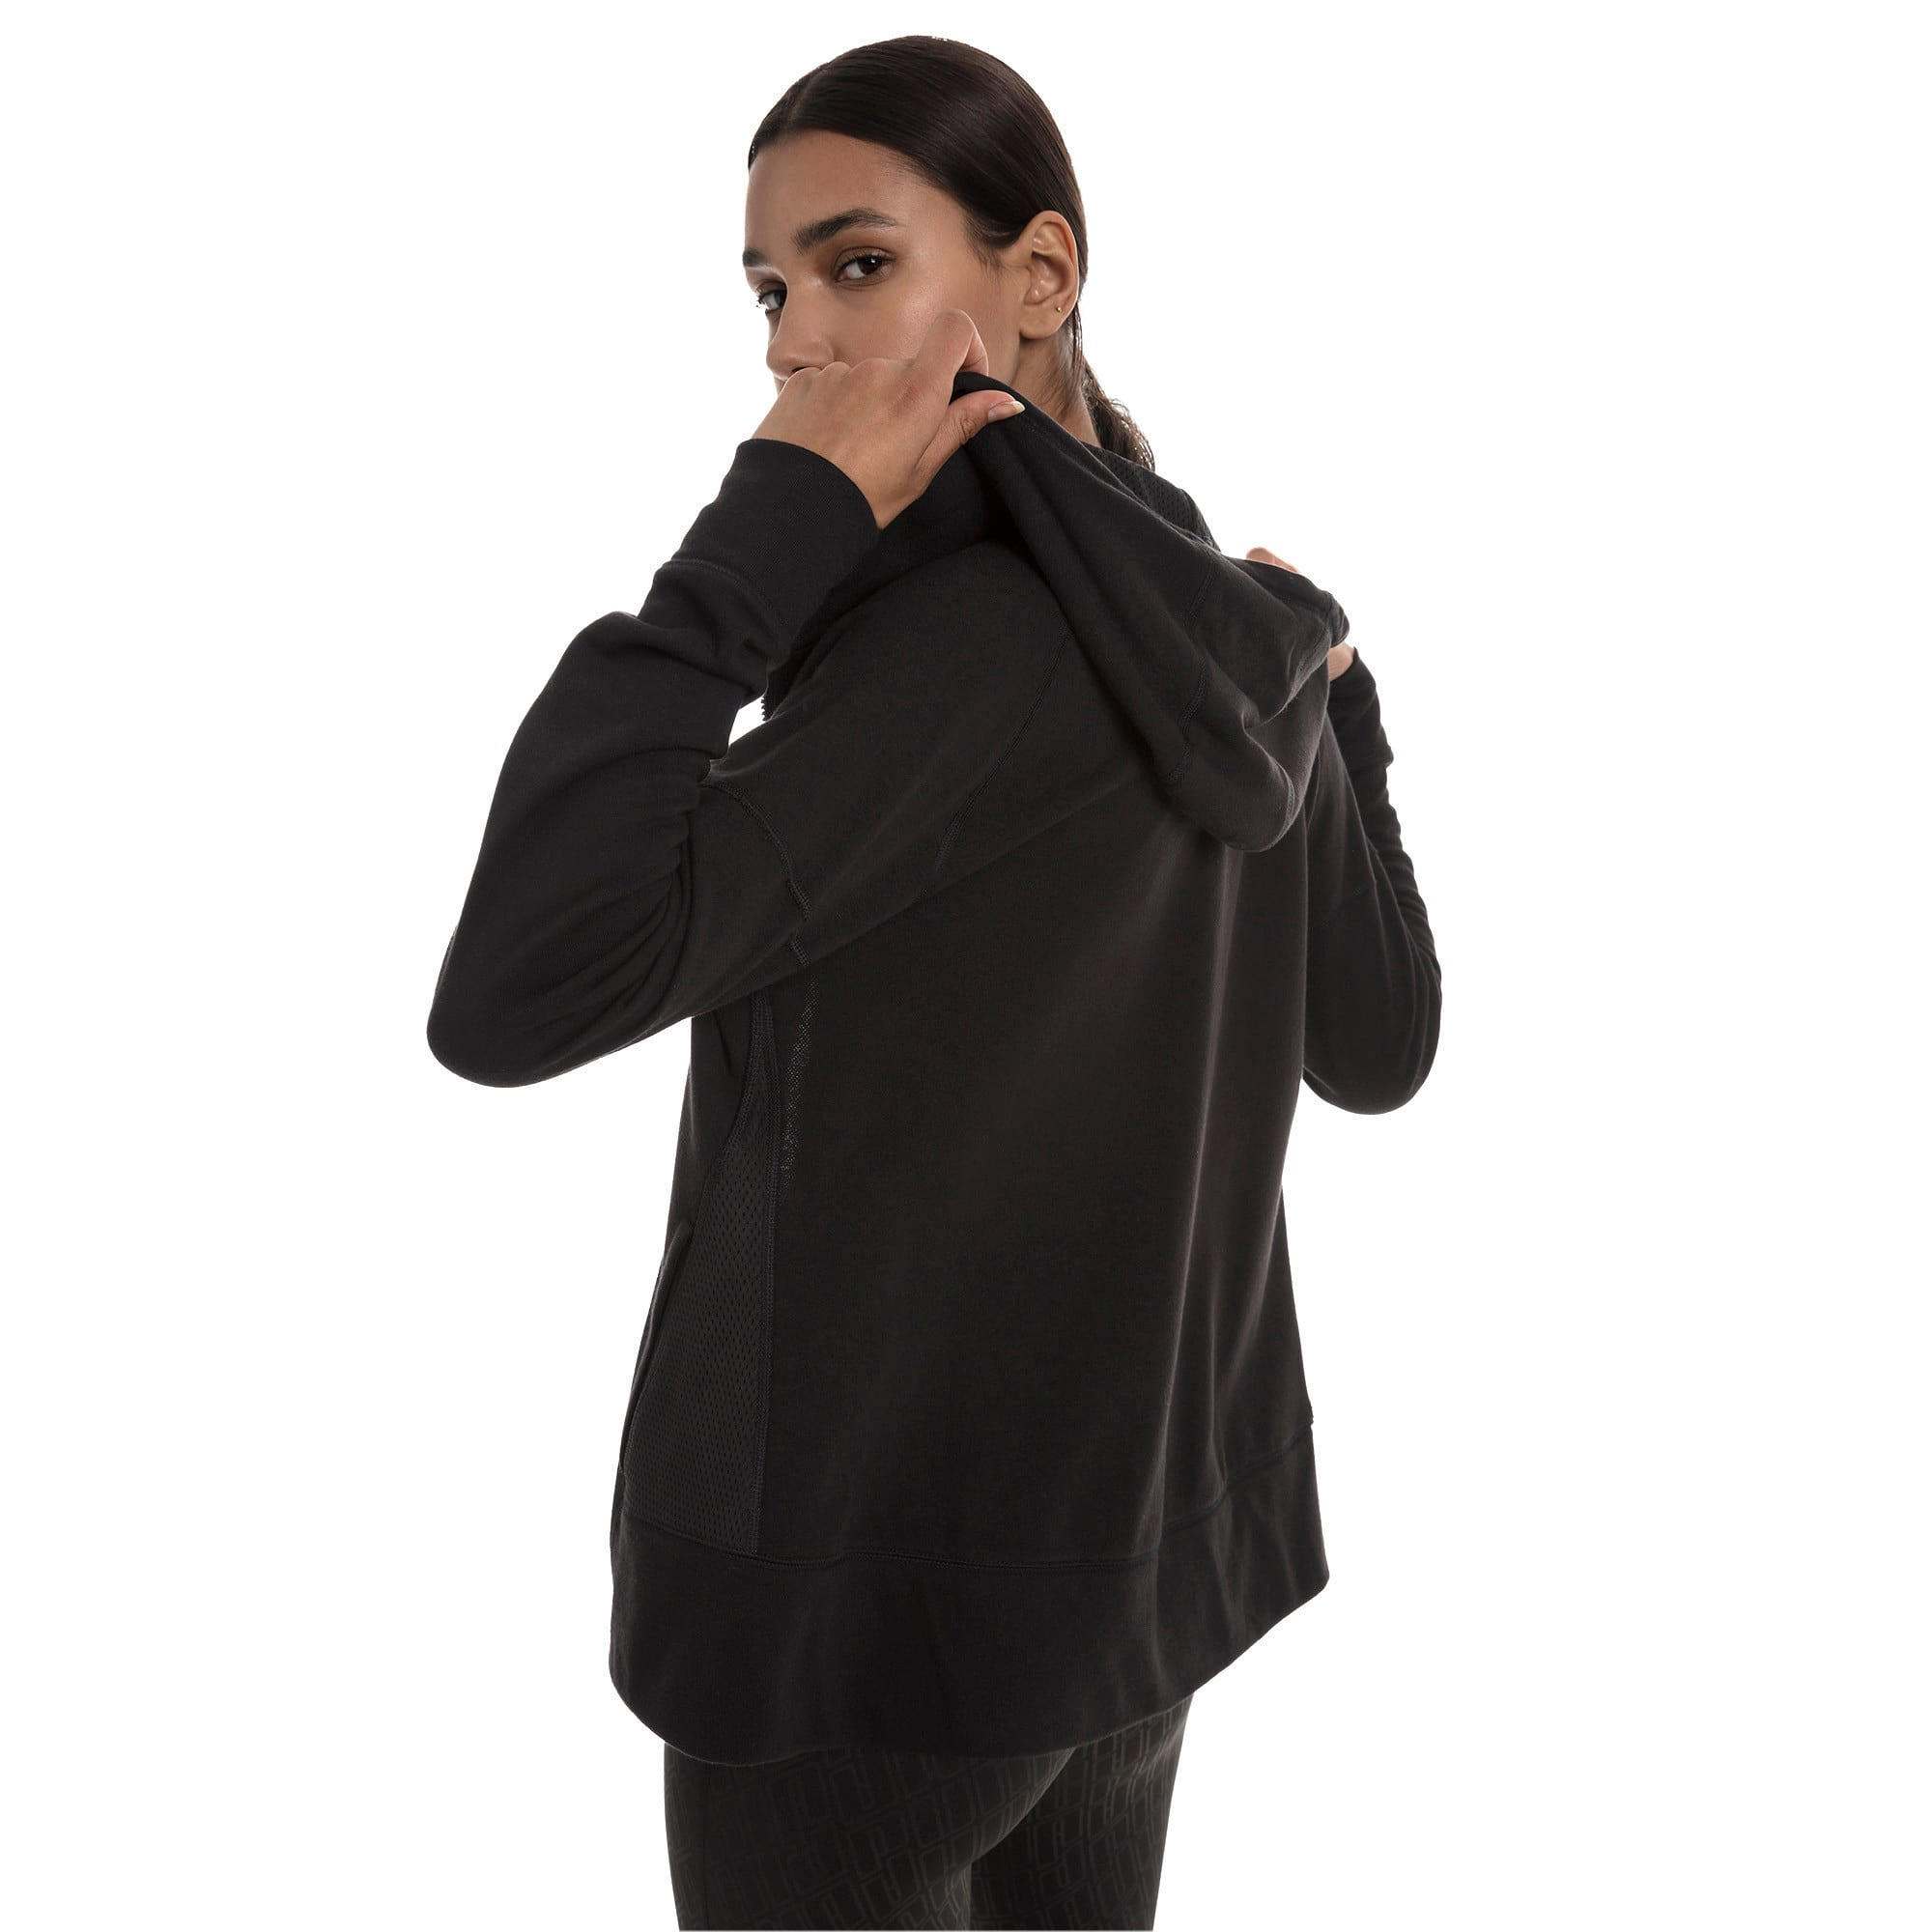 Thumbnail 2 of Yogini Knitted Full Zip Women's Track Jacket, Cotton Black, medium-IND